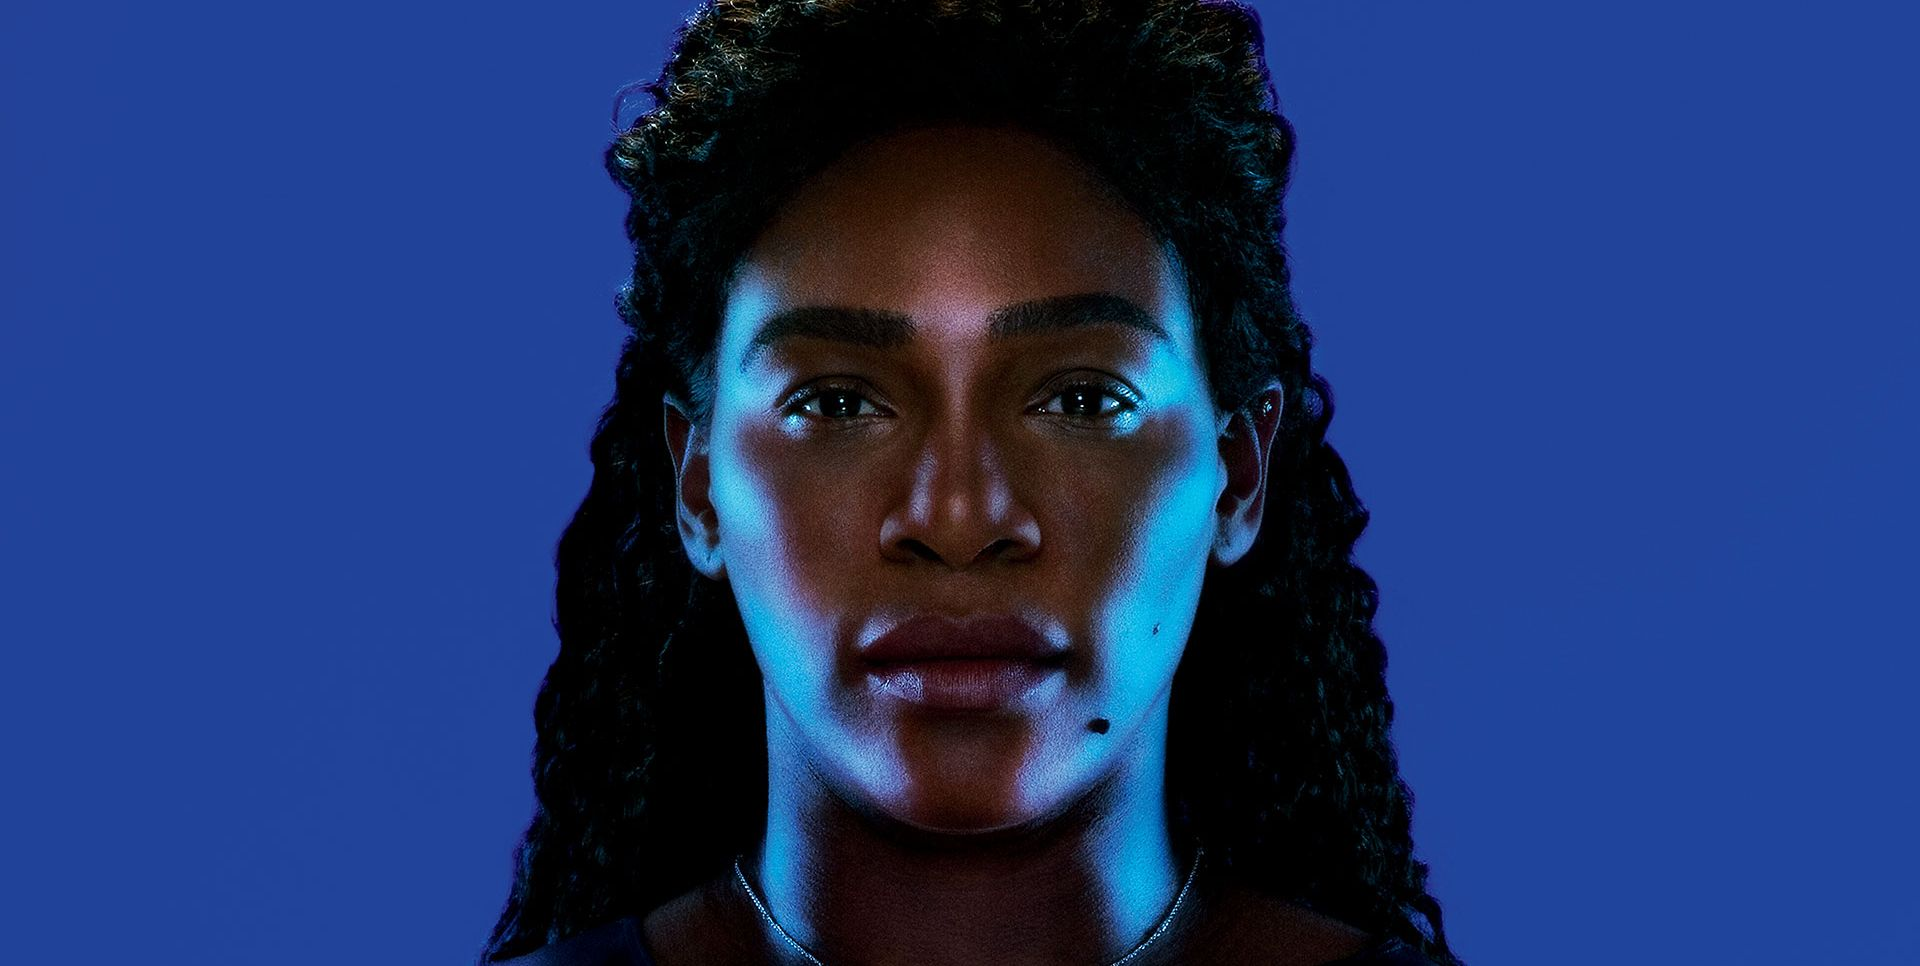 Nike x Virgil Abloh x Serena Williams